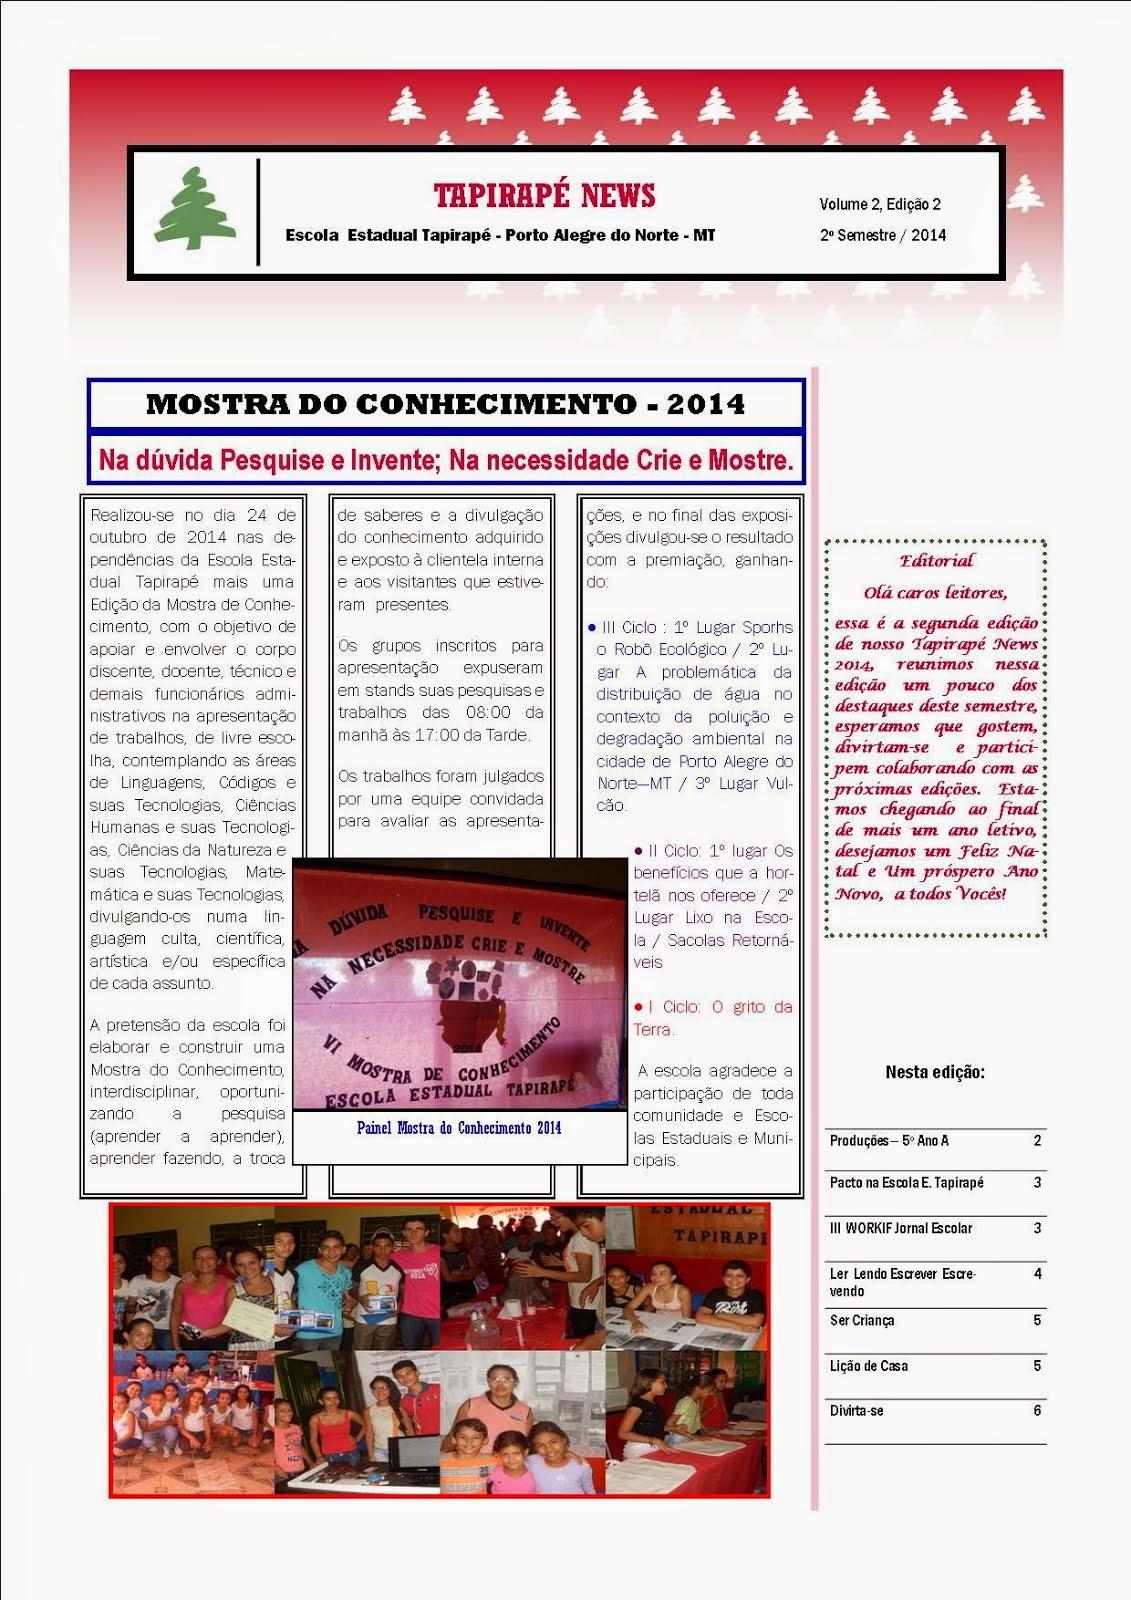 TAPIRAPÉ NEWS - 2ª Edição 2014